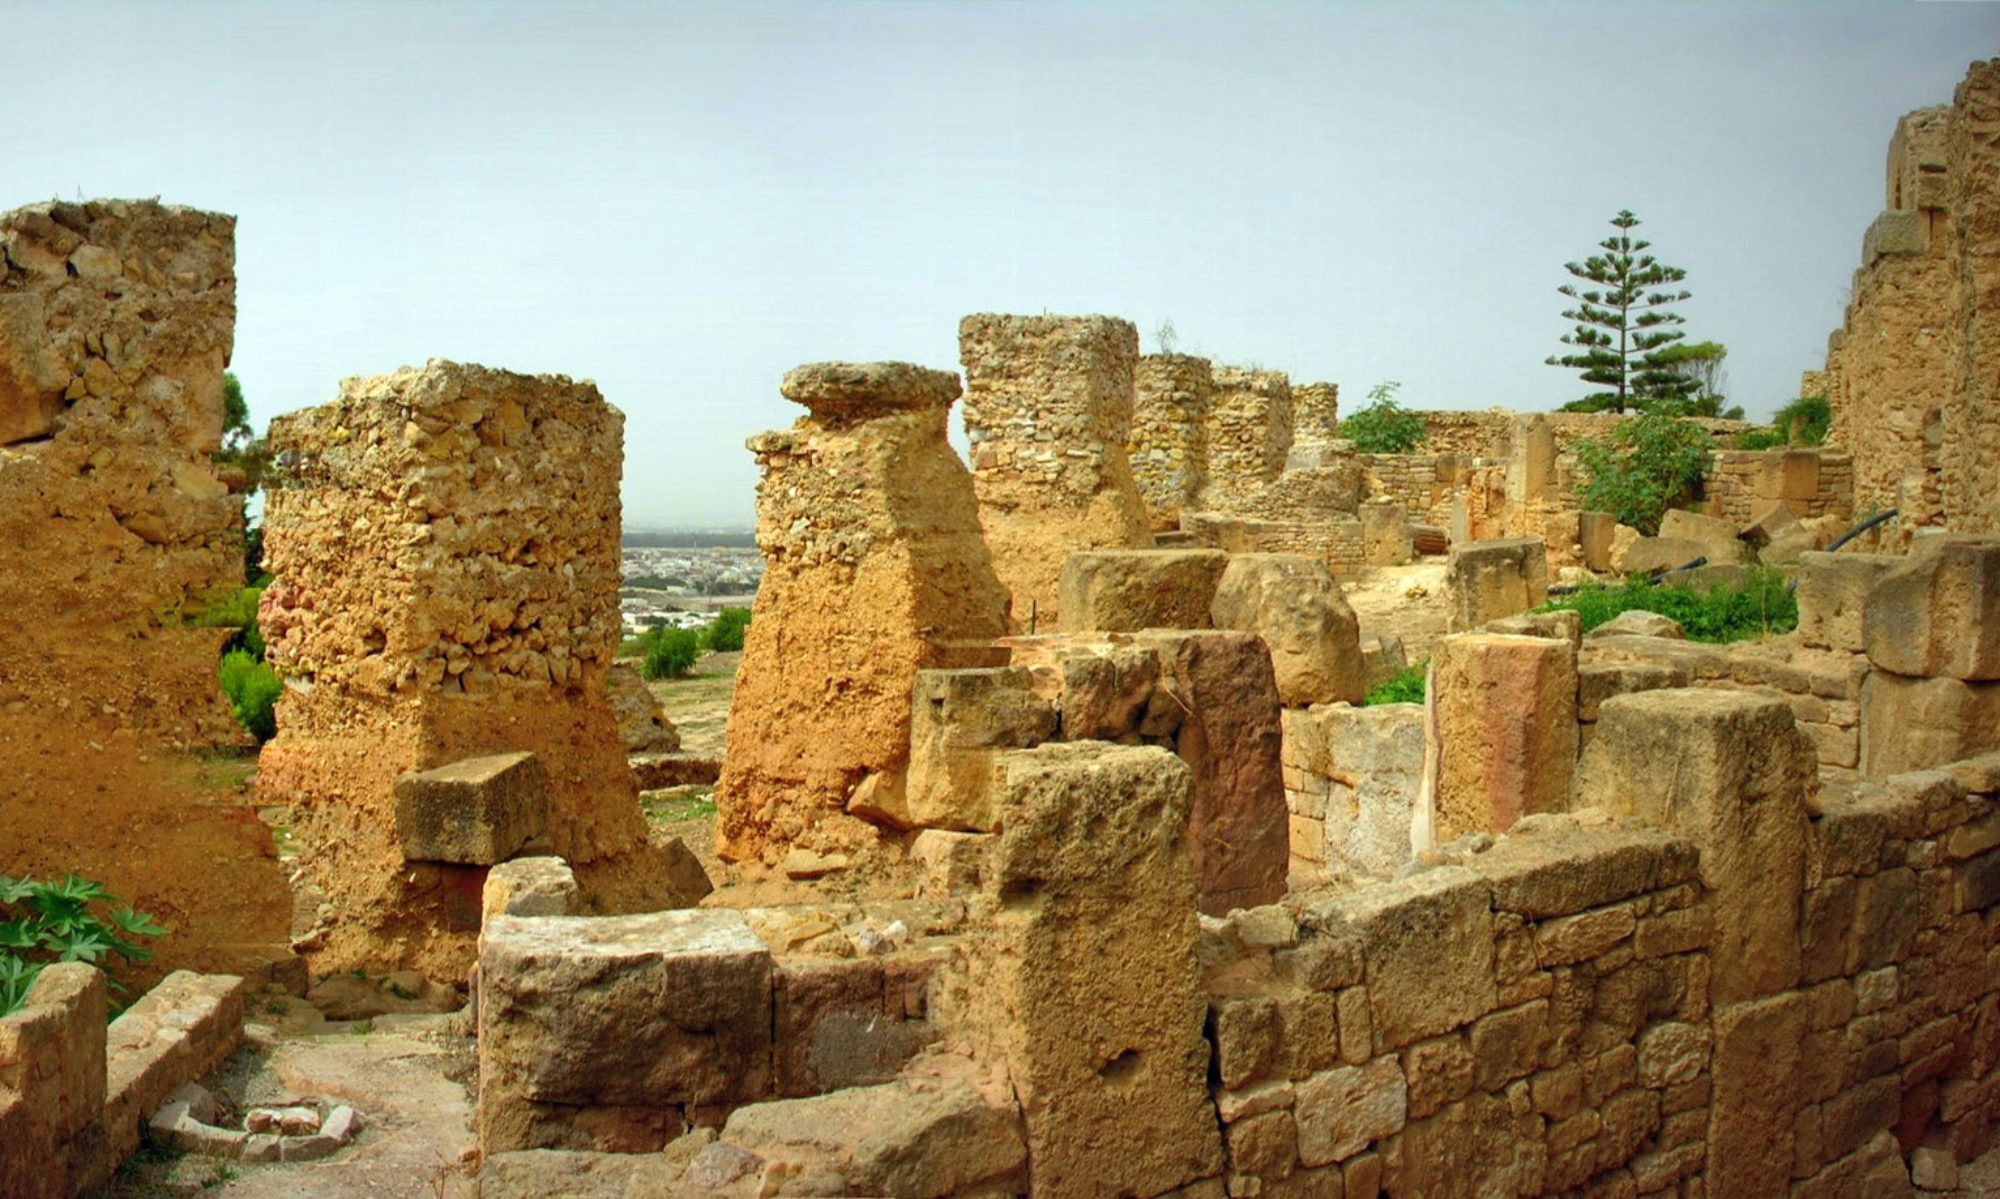 Scuola Archeologica Italiana di Cartagine (SAIC)